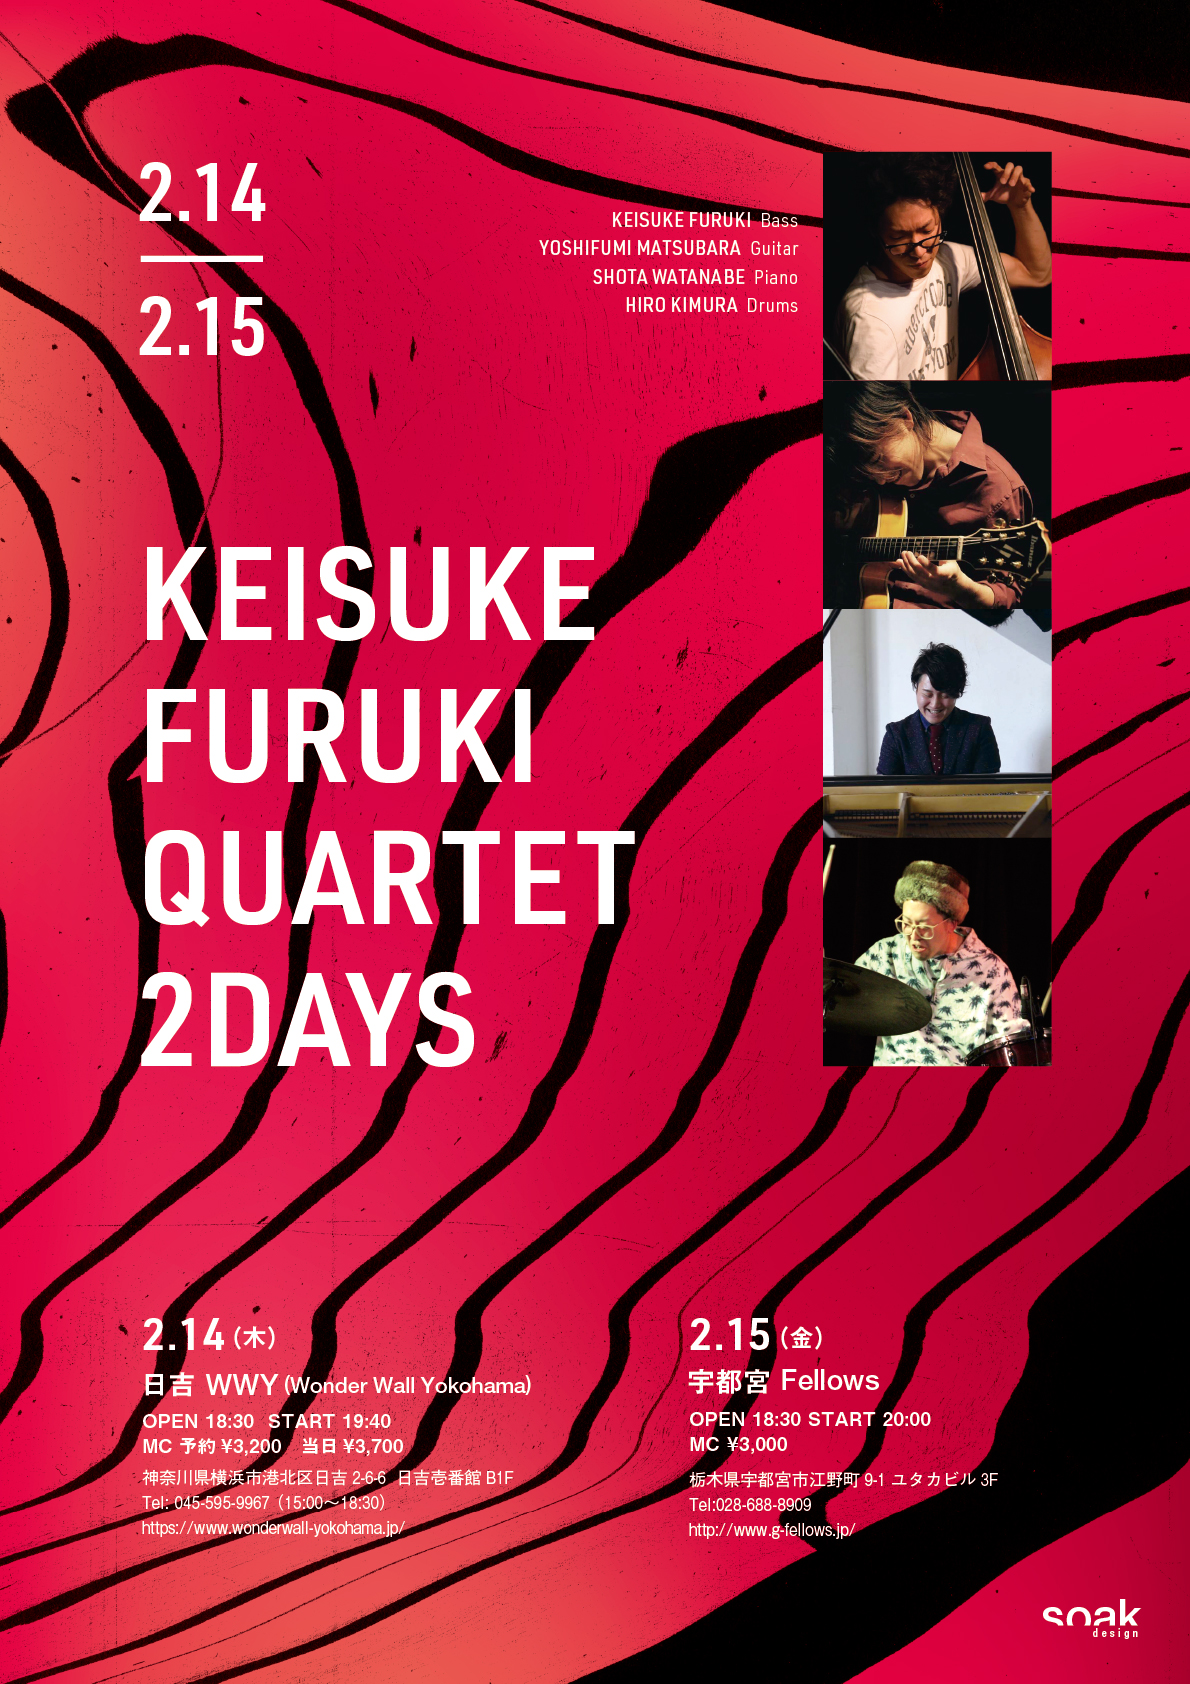 Keisuke Furuki Quartet Flyer